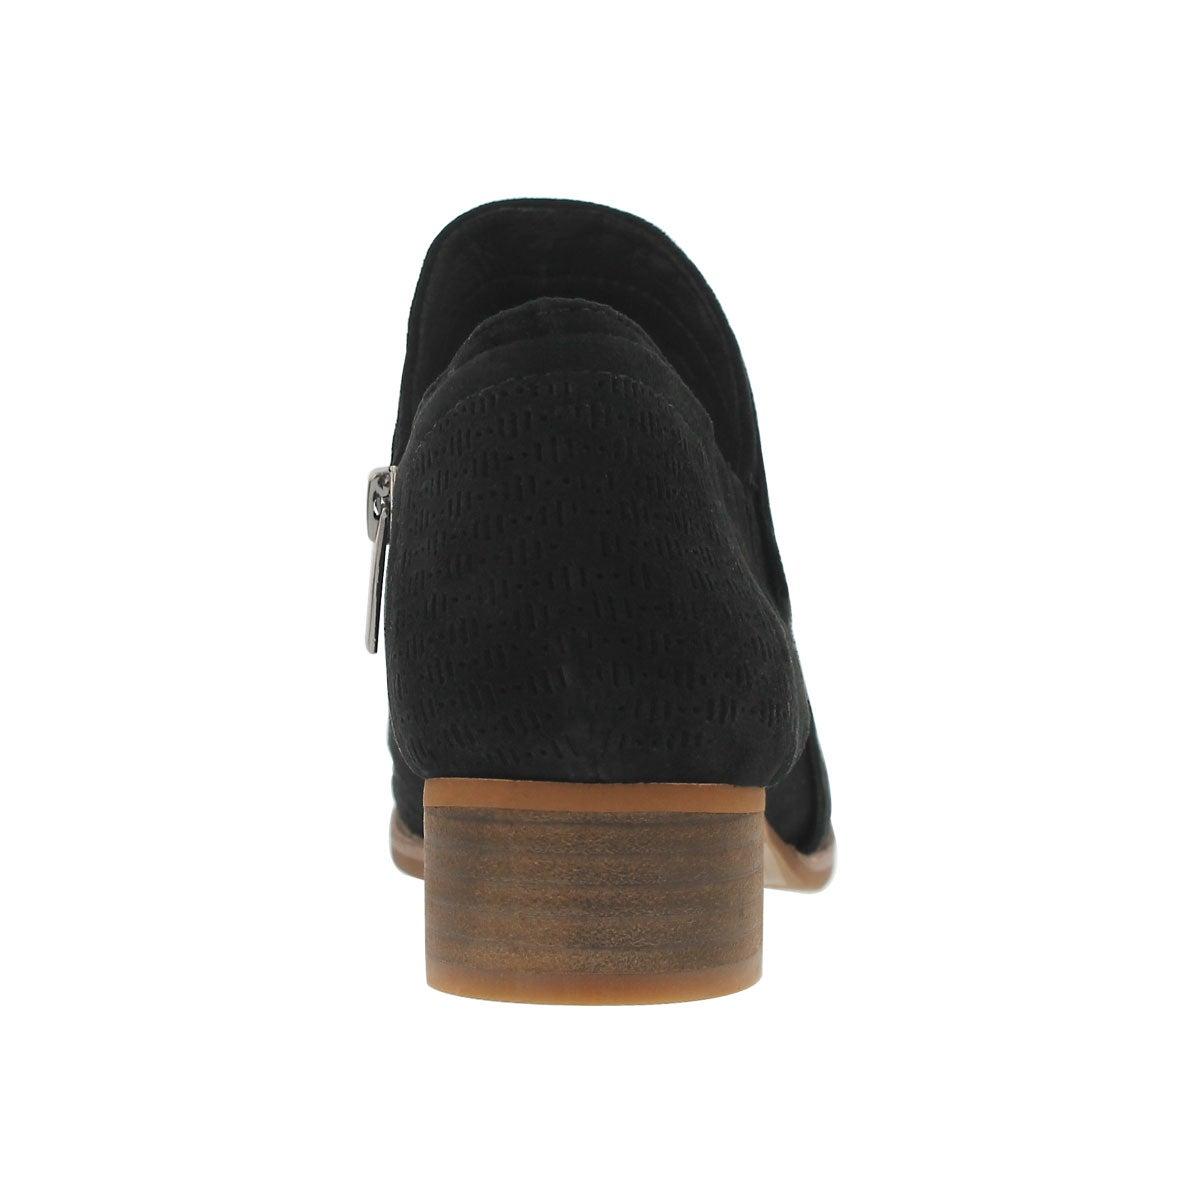 Lds Clorieea black slip on casual bootie